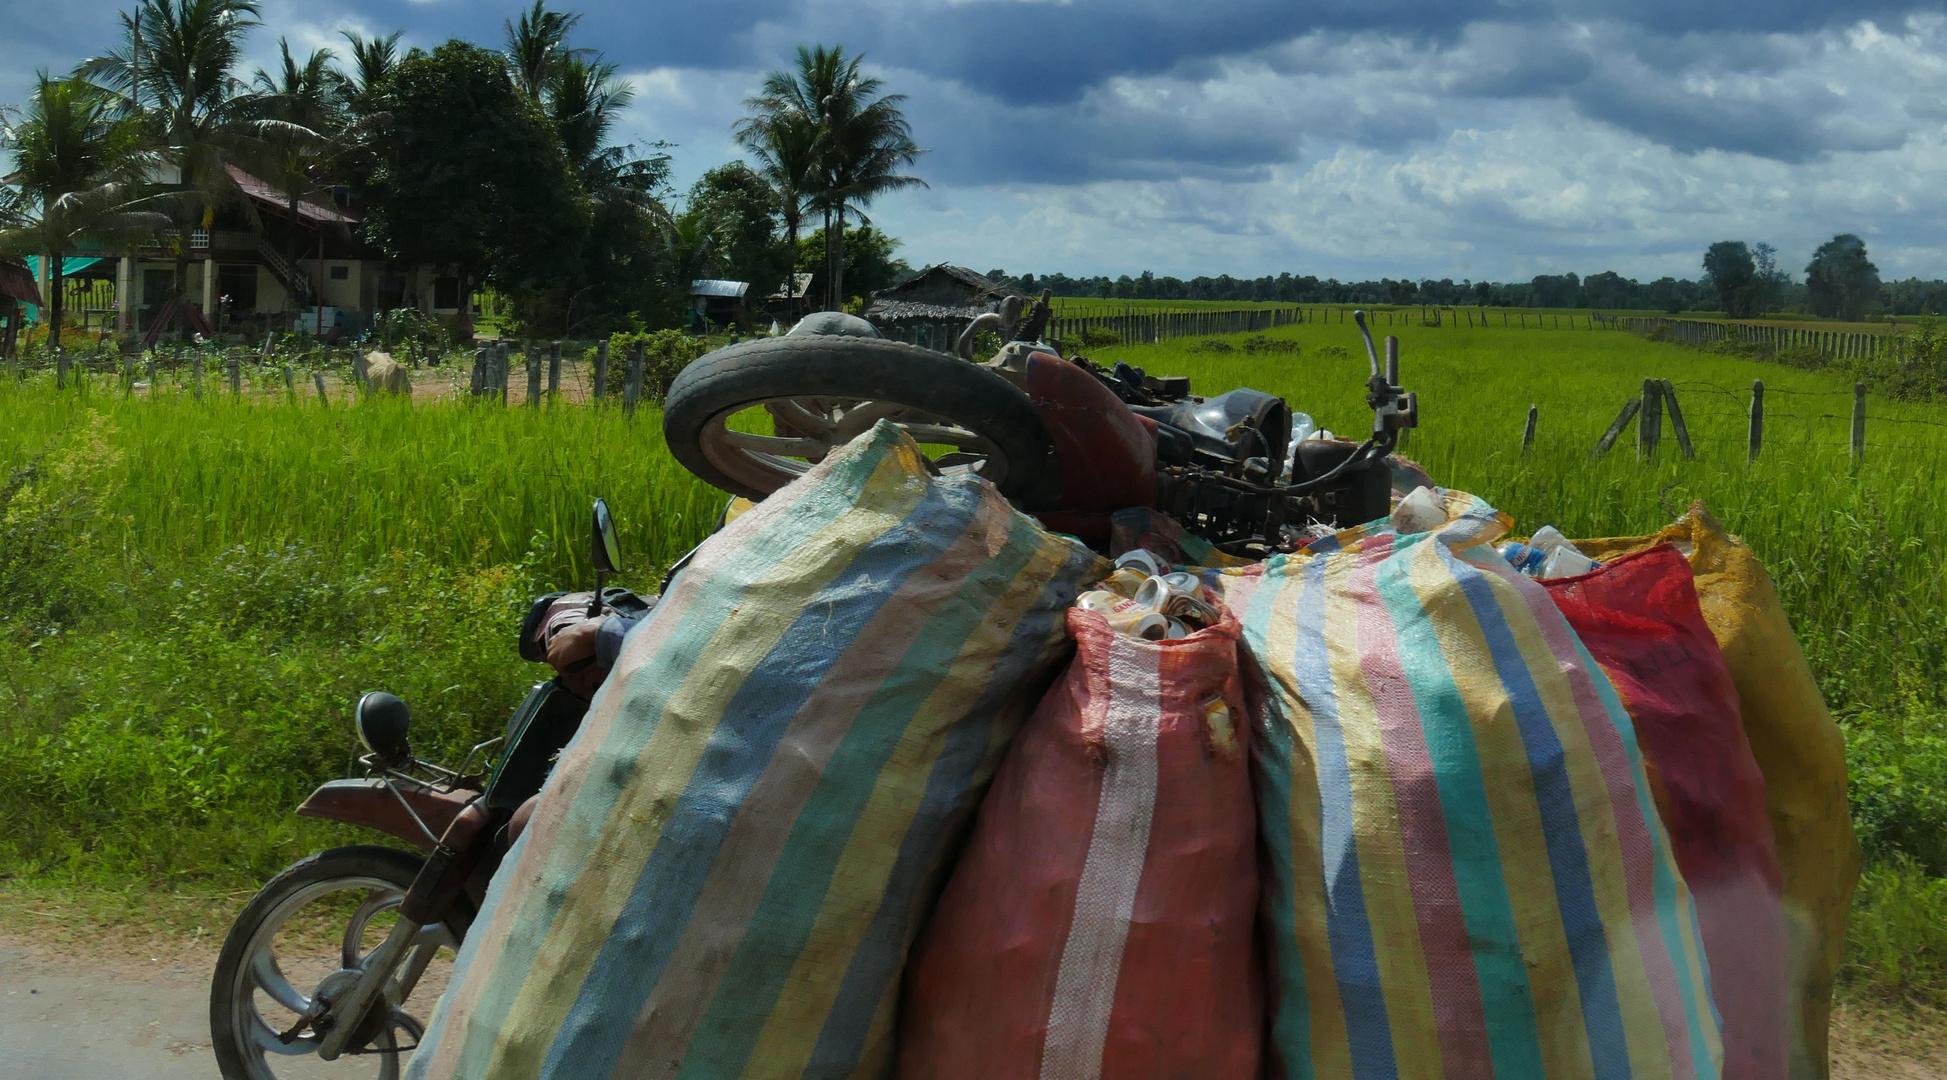 ...Transport in Kambodscha...